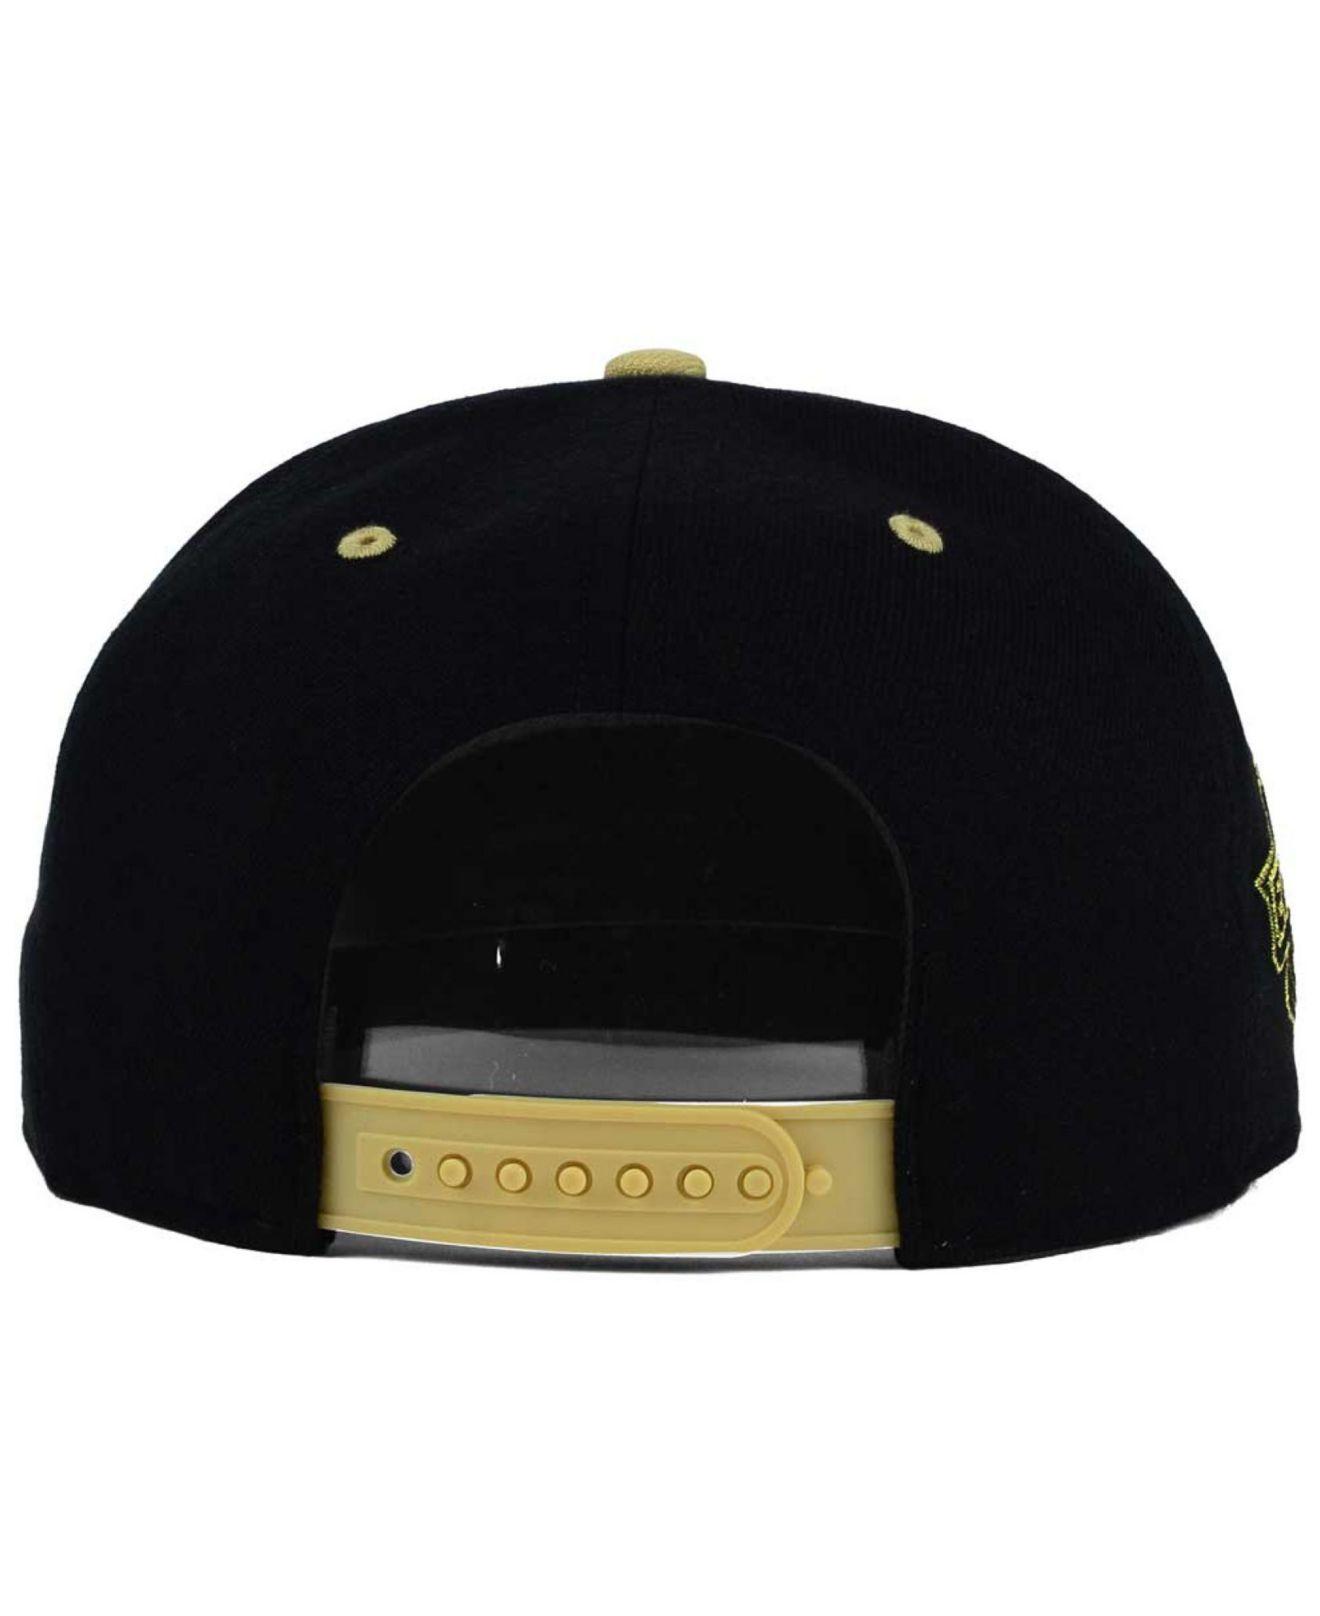 dd909c229c0 ... get lyst 47 brand pittsburgh penguins gold rush snapback cap in black  43a21 5e340